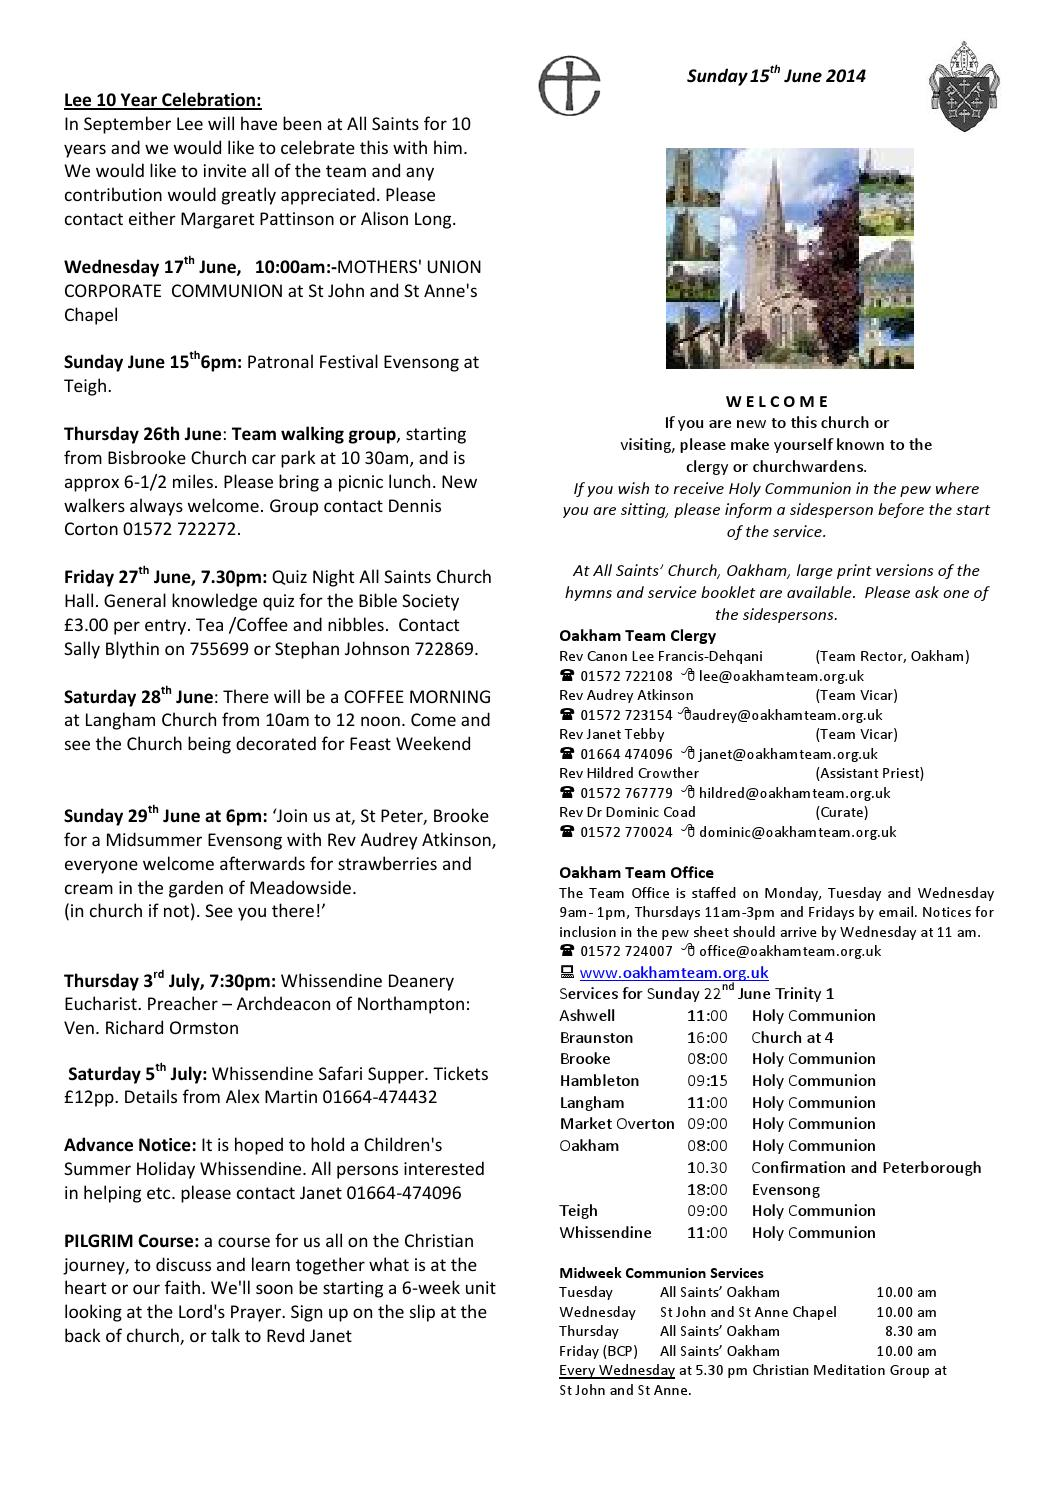 Pewsheet - 15 June 2014 (Whissendine) by Oakham Team Ministry - issuu